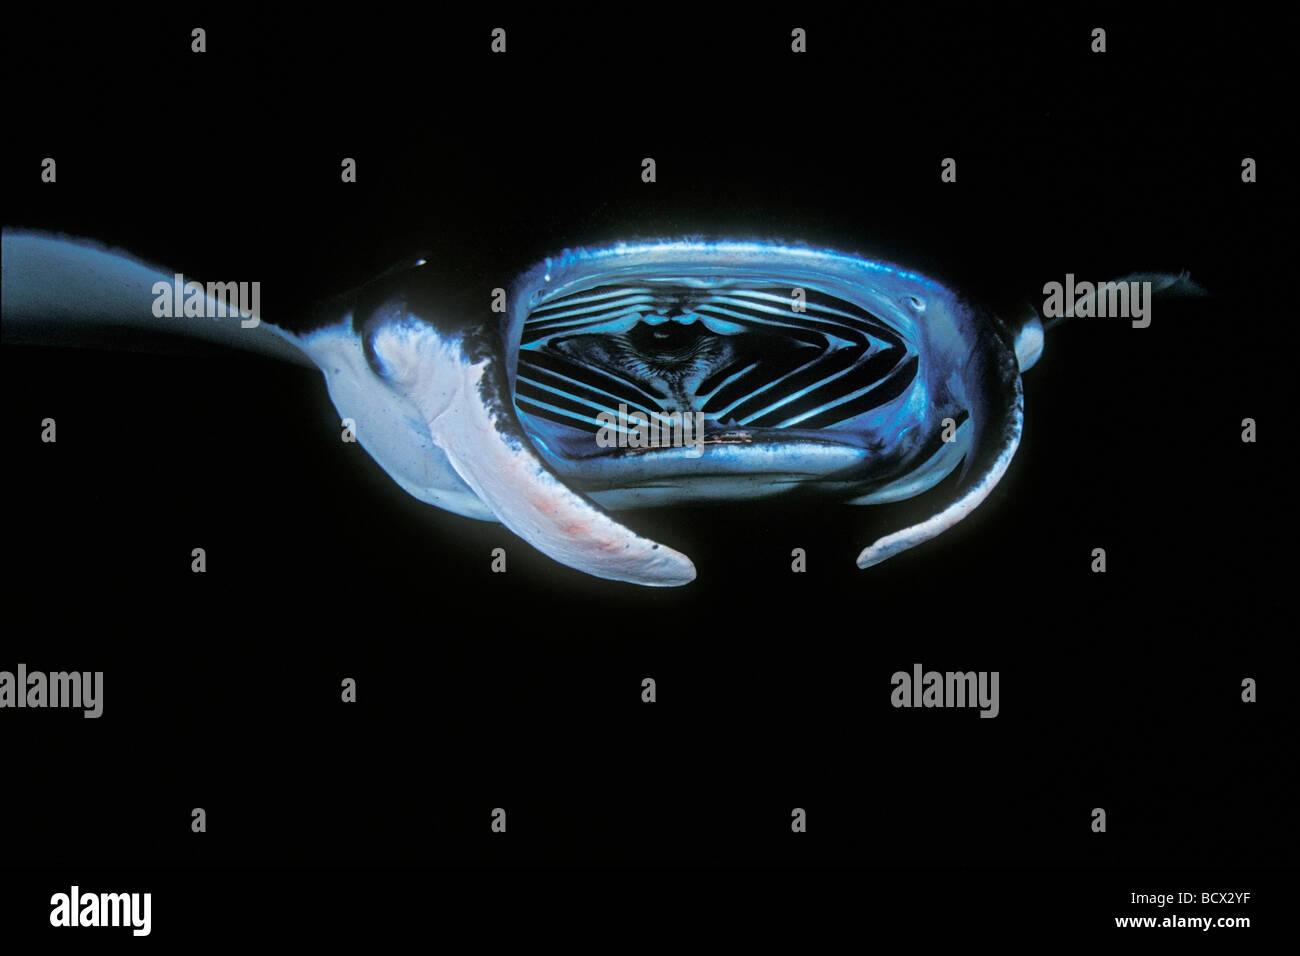 manta rays feeding on plankton at night, Manta birostris, Hawaii, USA, Kona, Big Island, Pacific Ocean - Stock Image